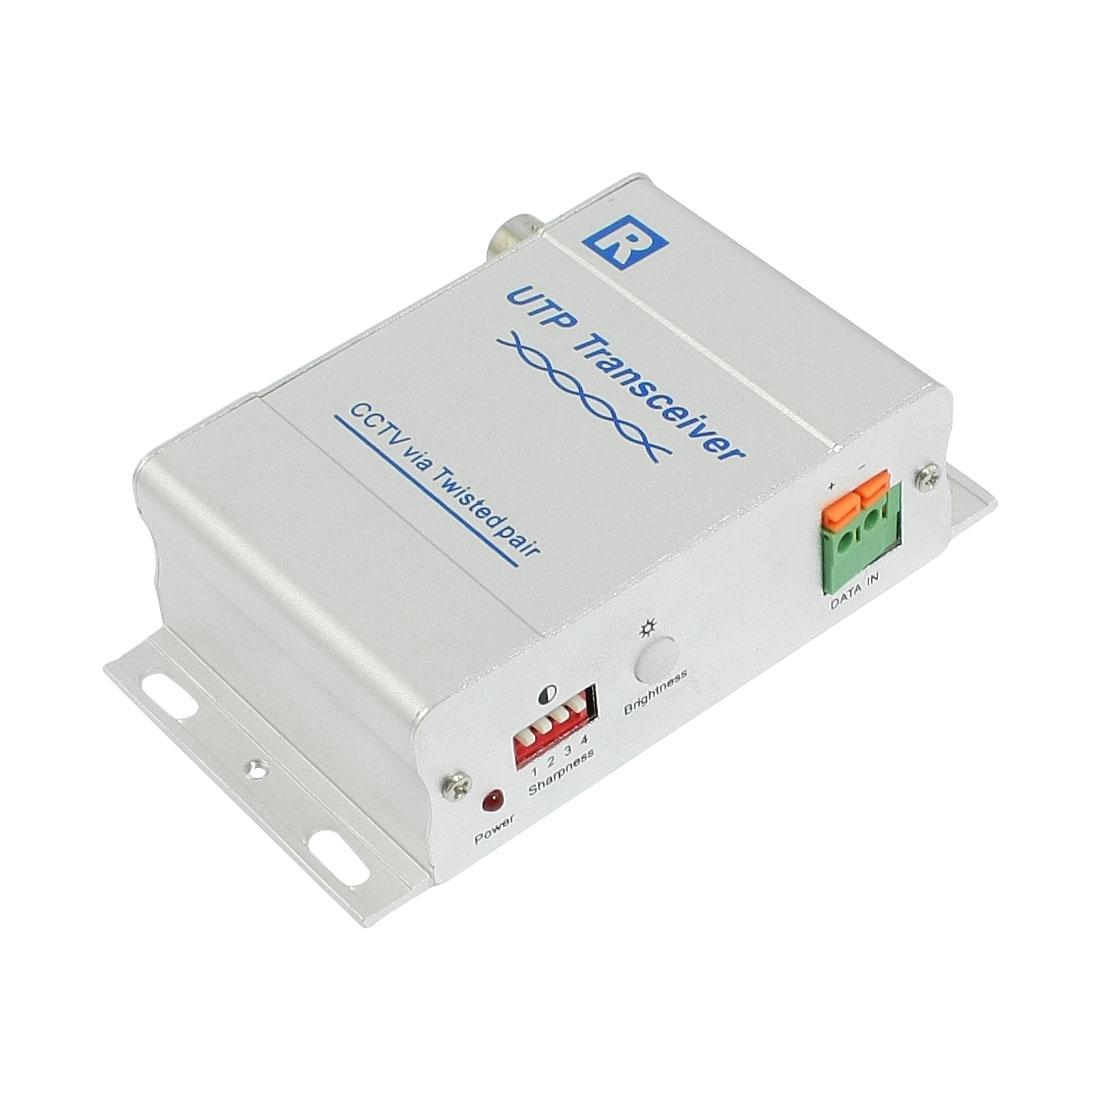 Image of CCTV Camera BNC Video Single Channel Active CCTV UTP Video Transceiver